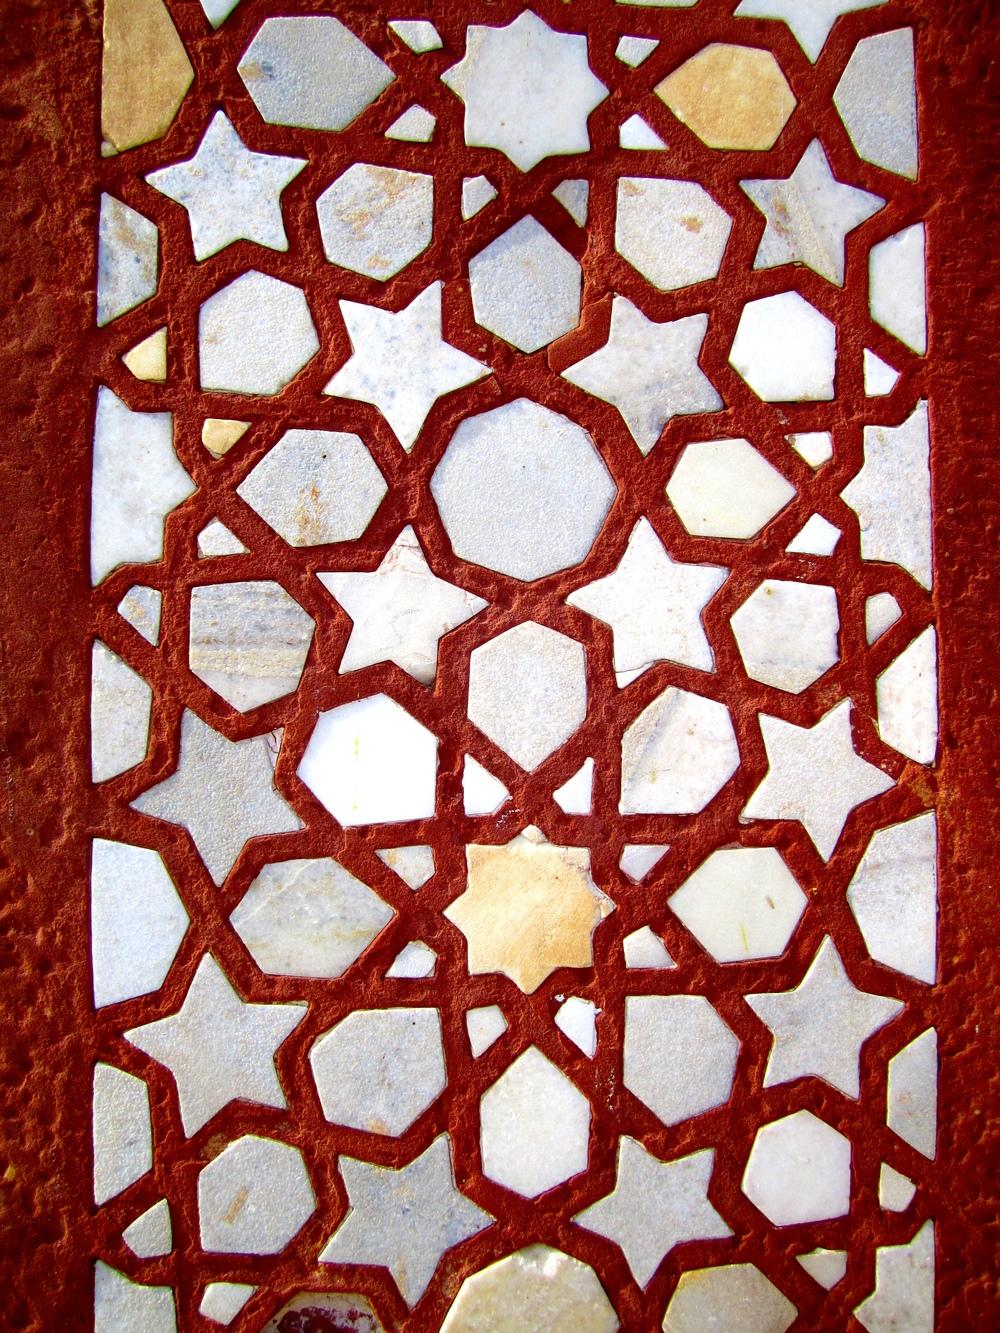 Delhi Agra_31Dec12 (169).jpg